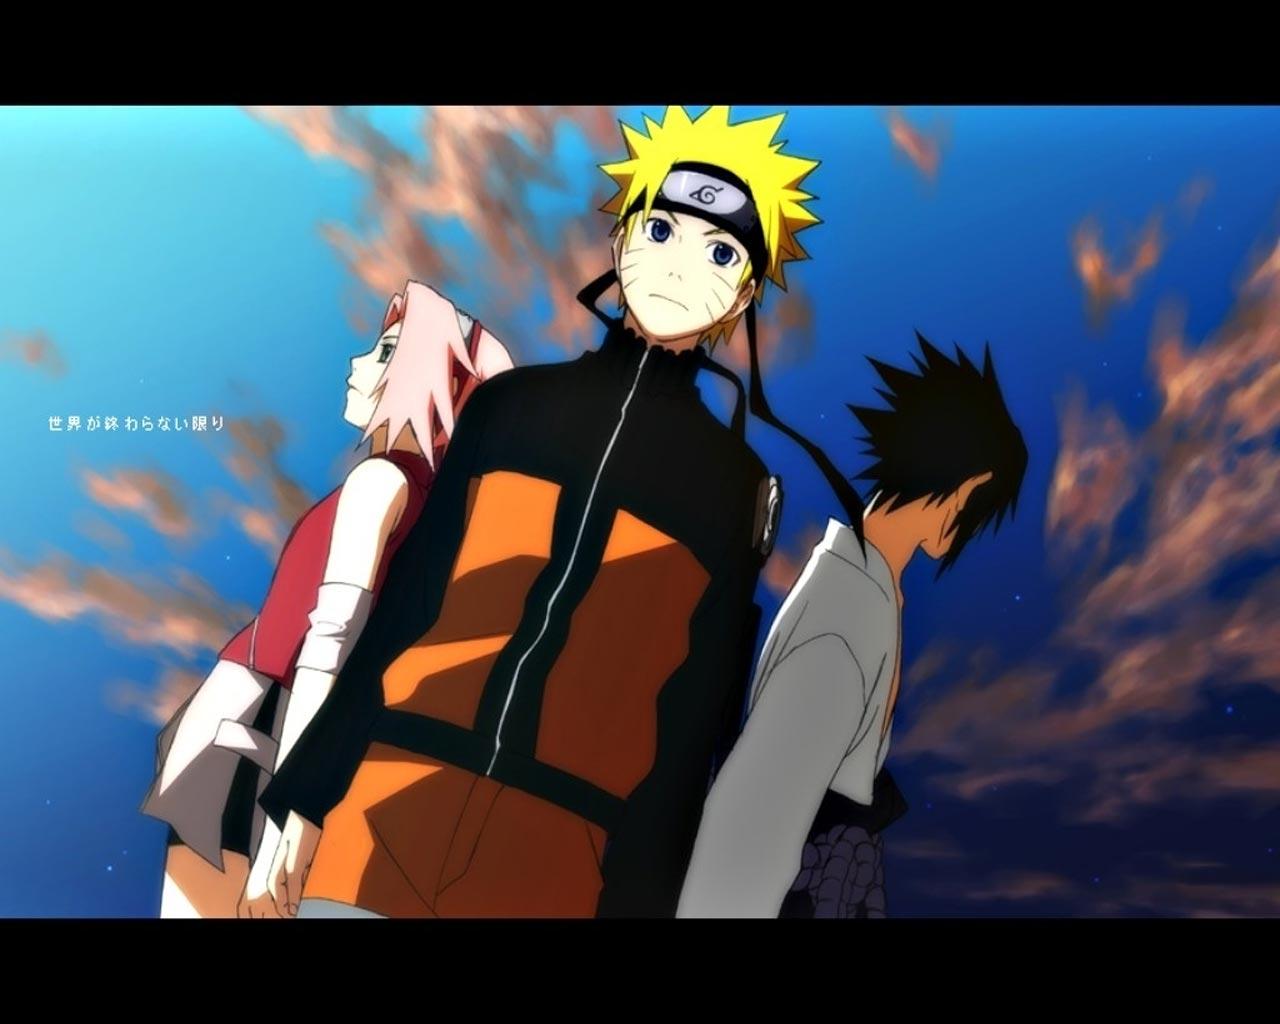 Naruto Episodes 24 Wide Wallpaper